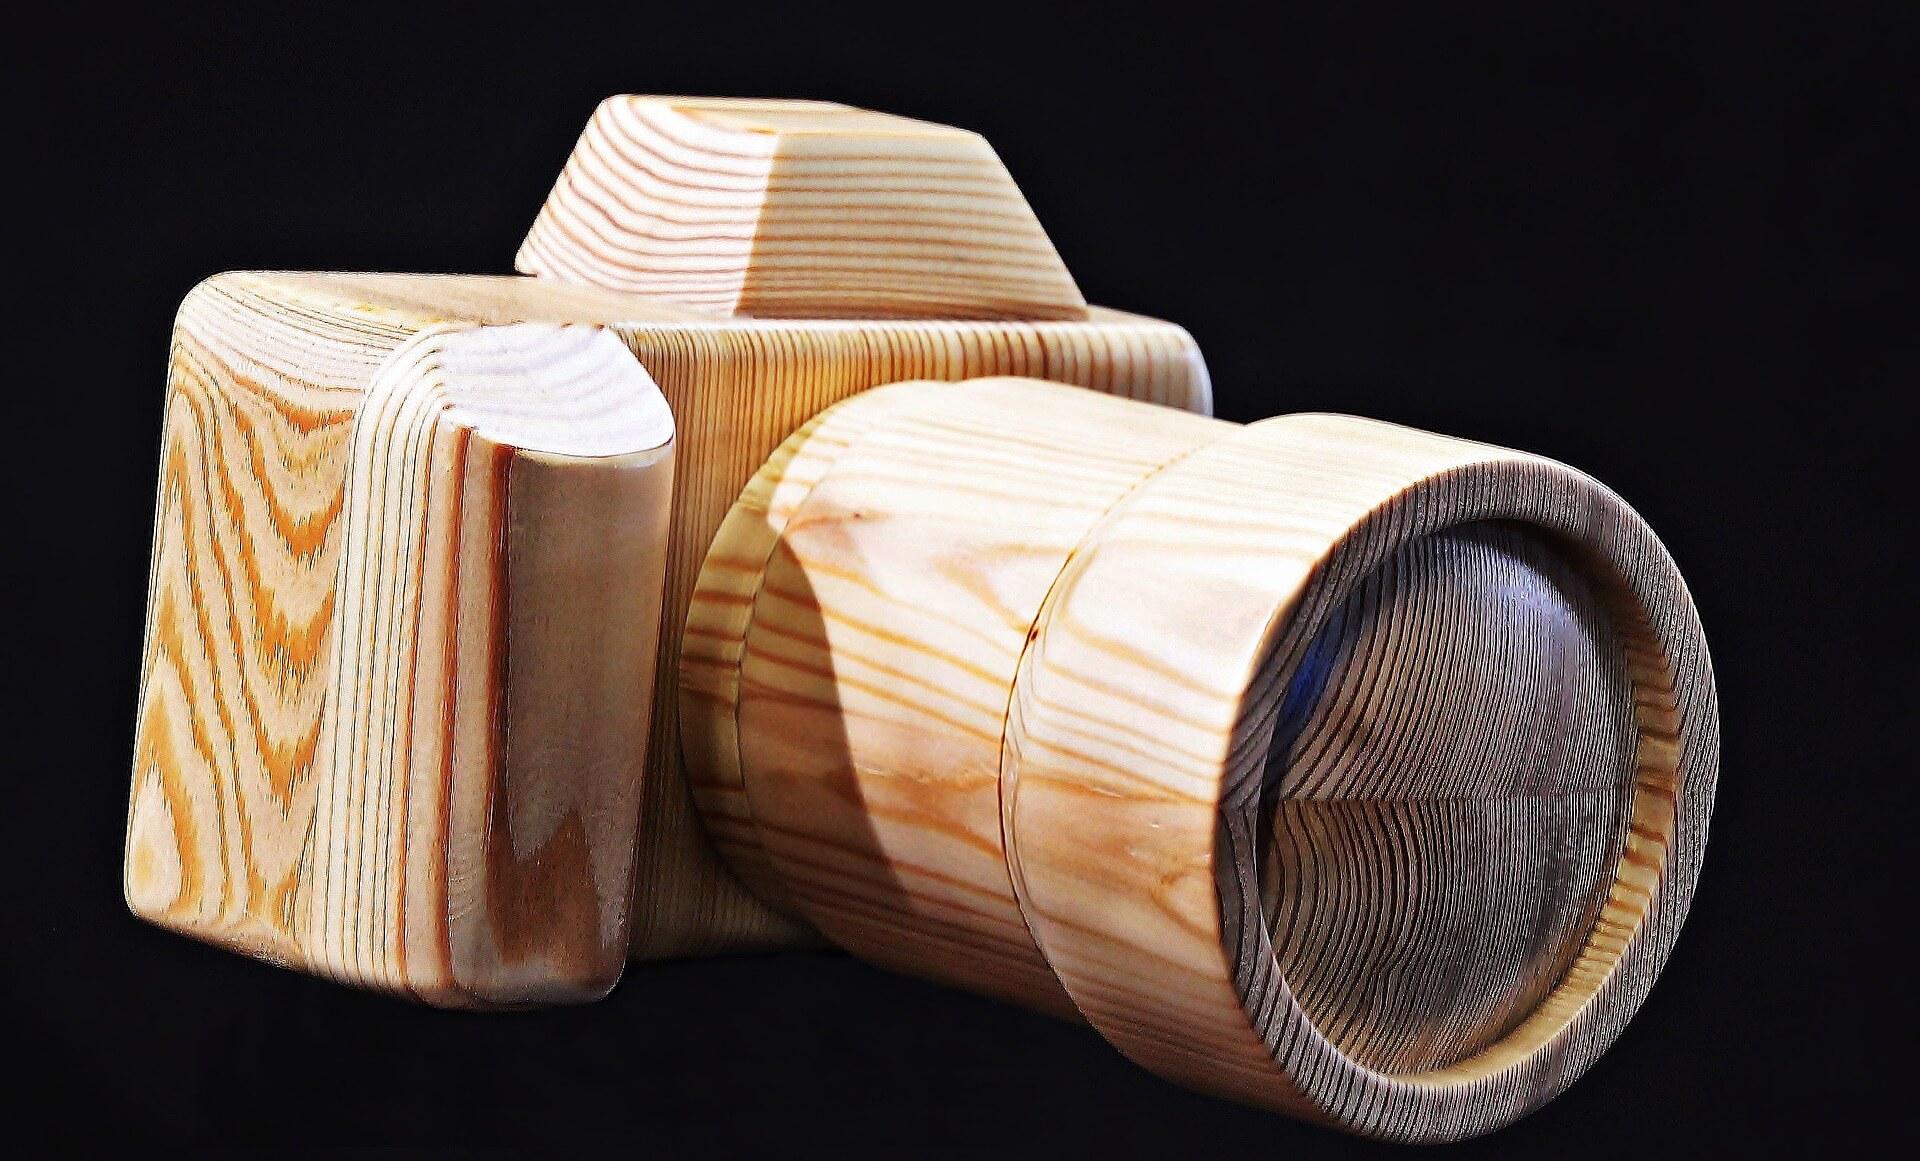 Holzgeschenke Kategorie Bild 5 Geschenke aus Holz